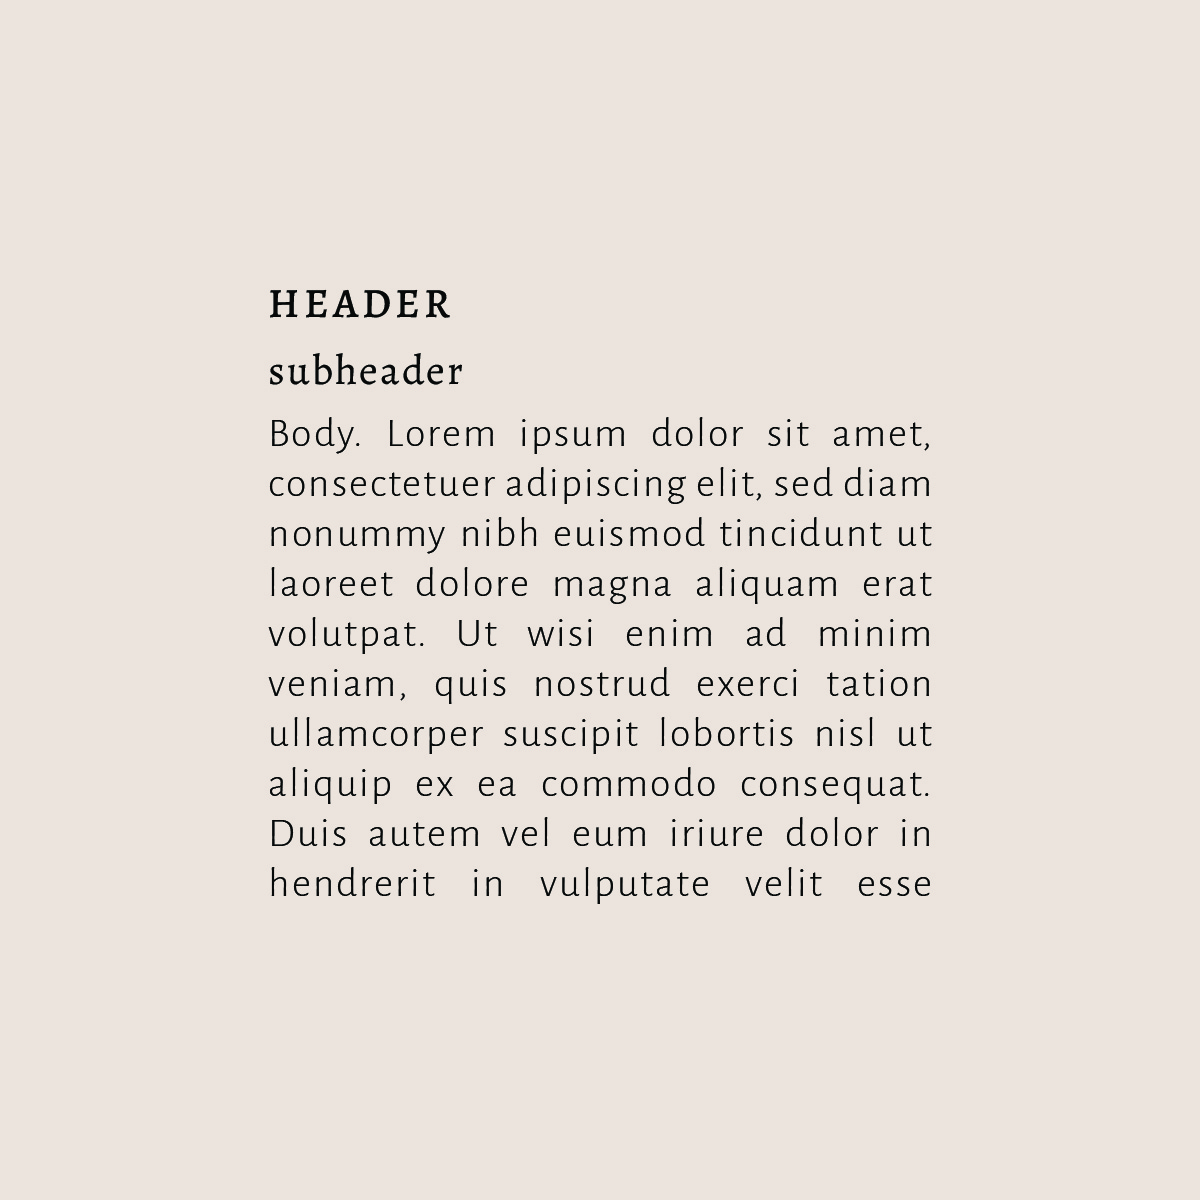 HBF font samply-01.jpg